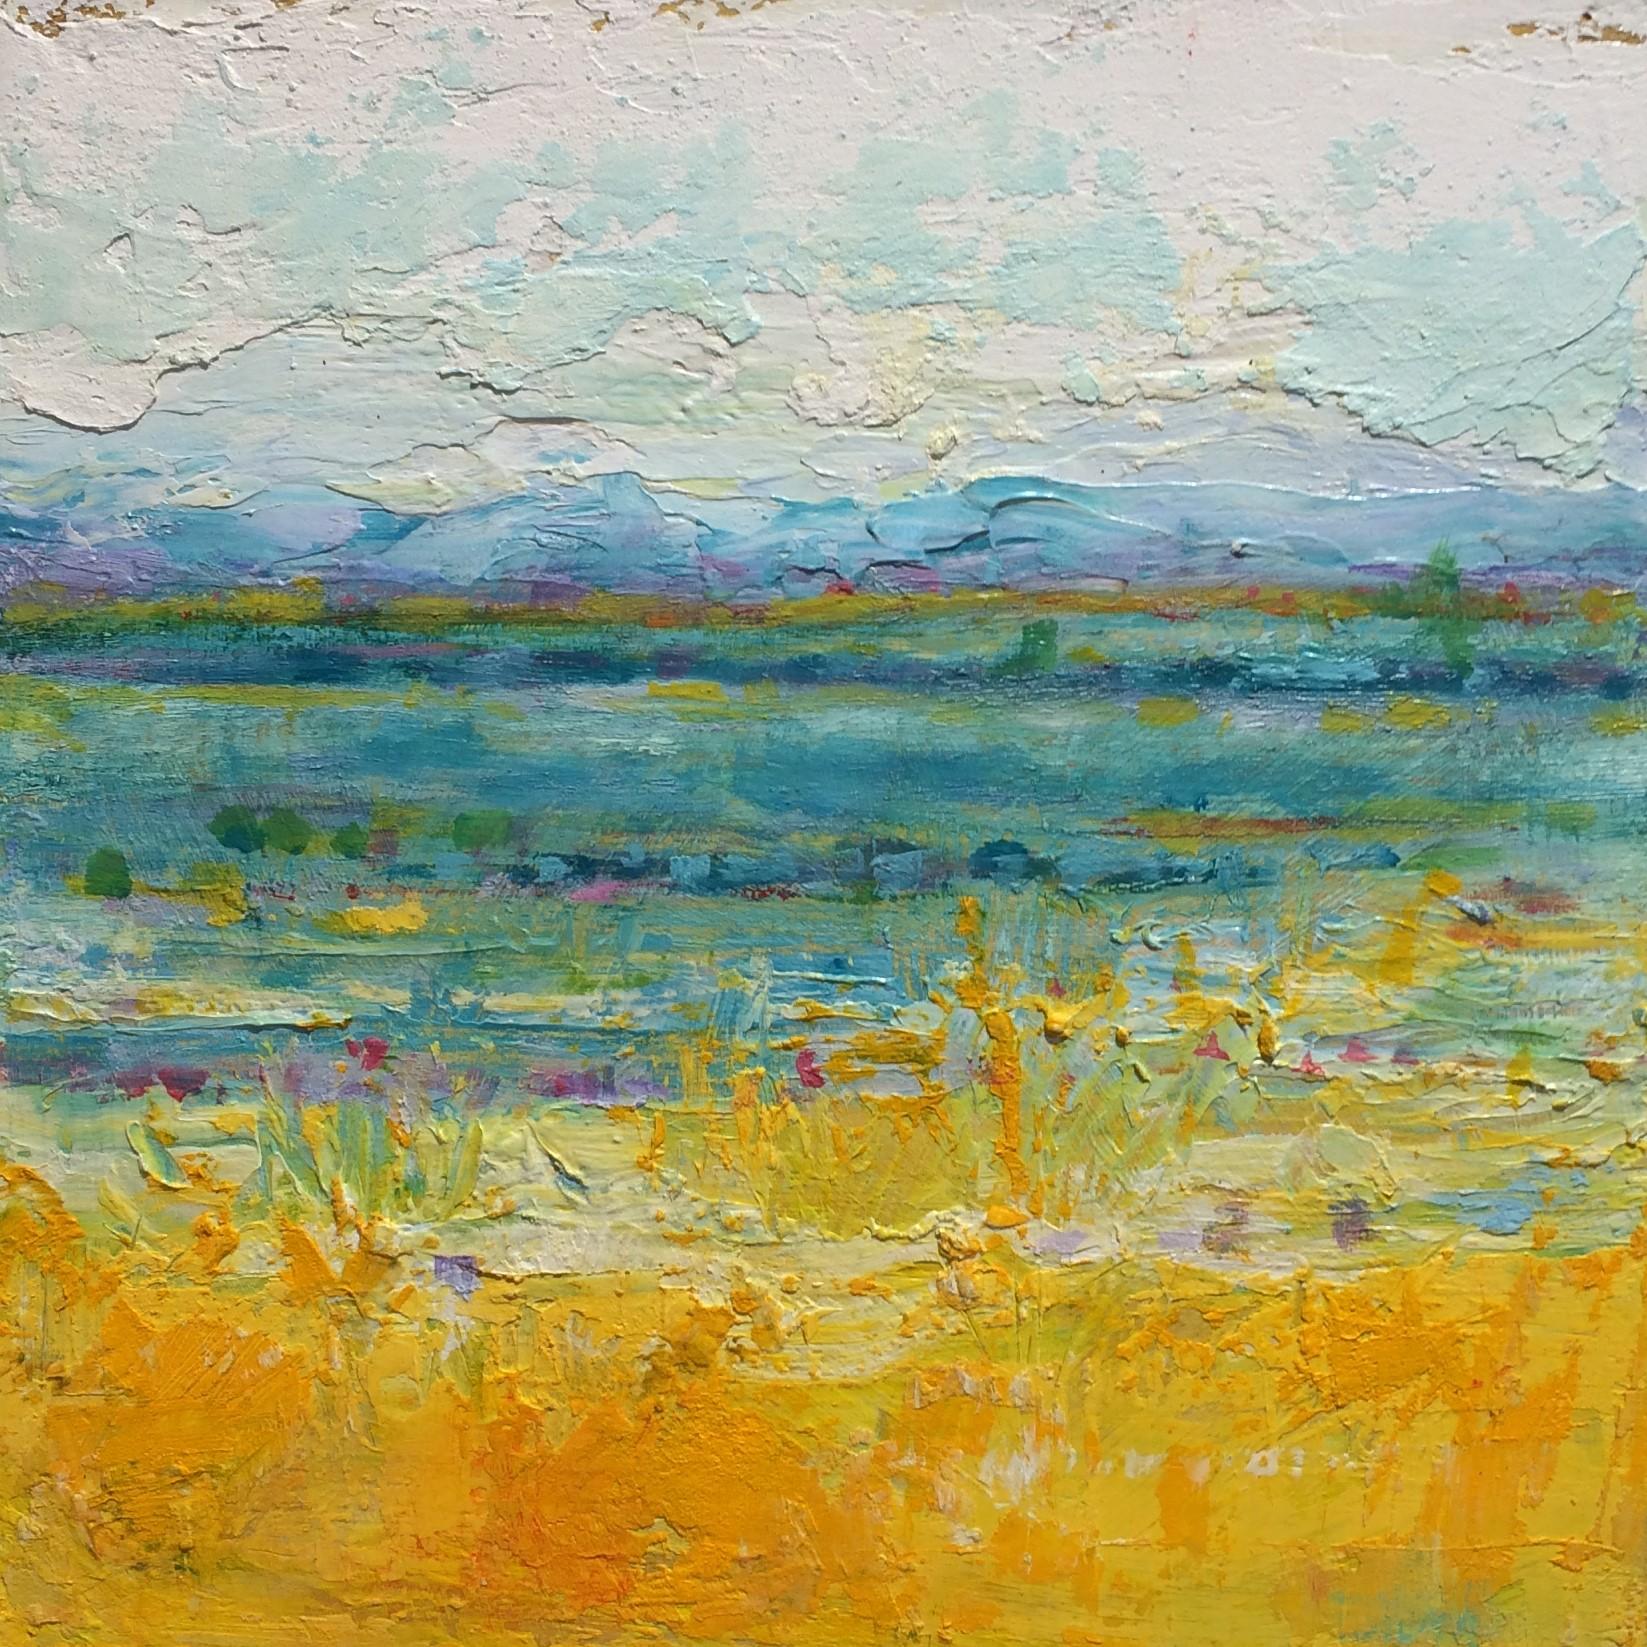 In the Distance | Visceral Landscapes | Kim Pollard | Canadian Artist | Abstract Landscape